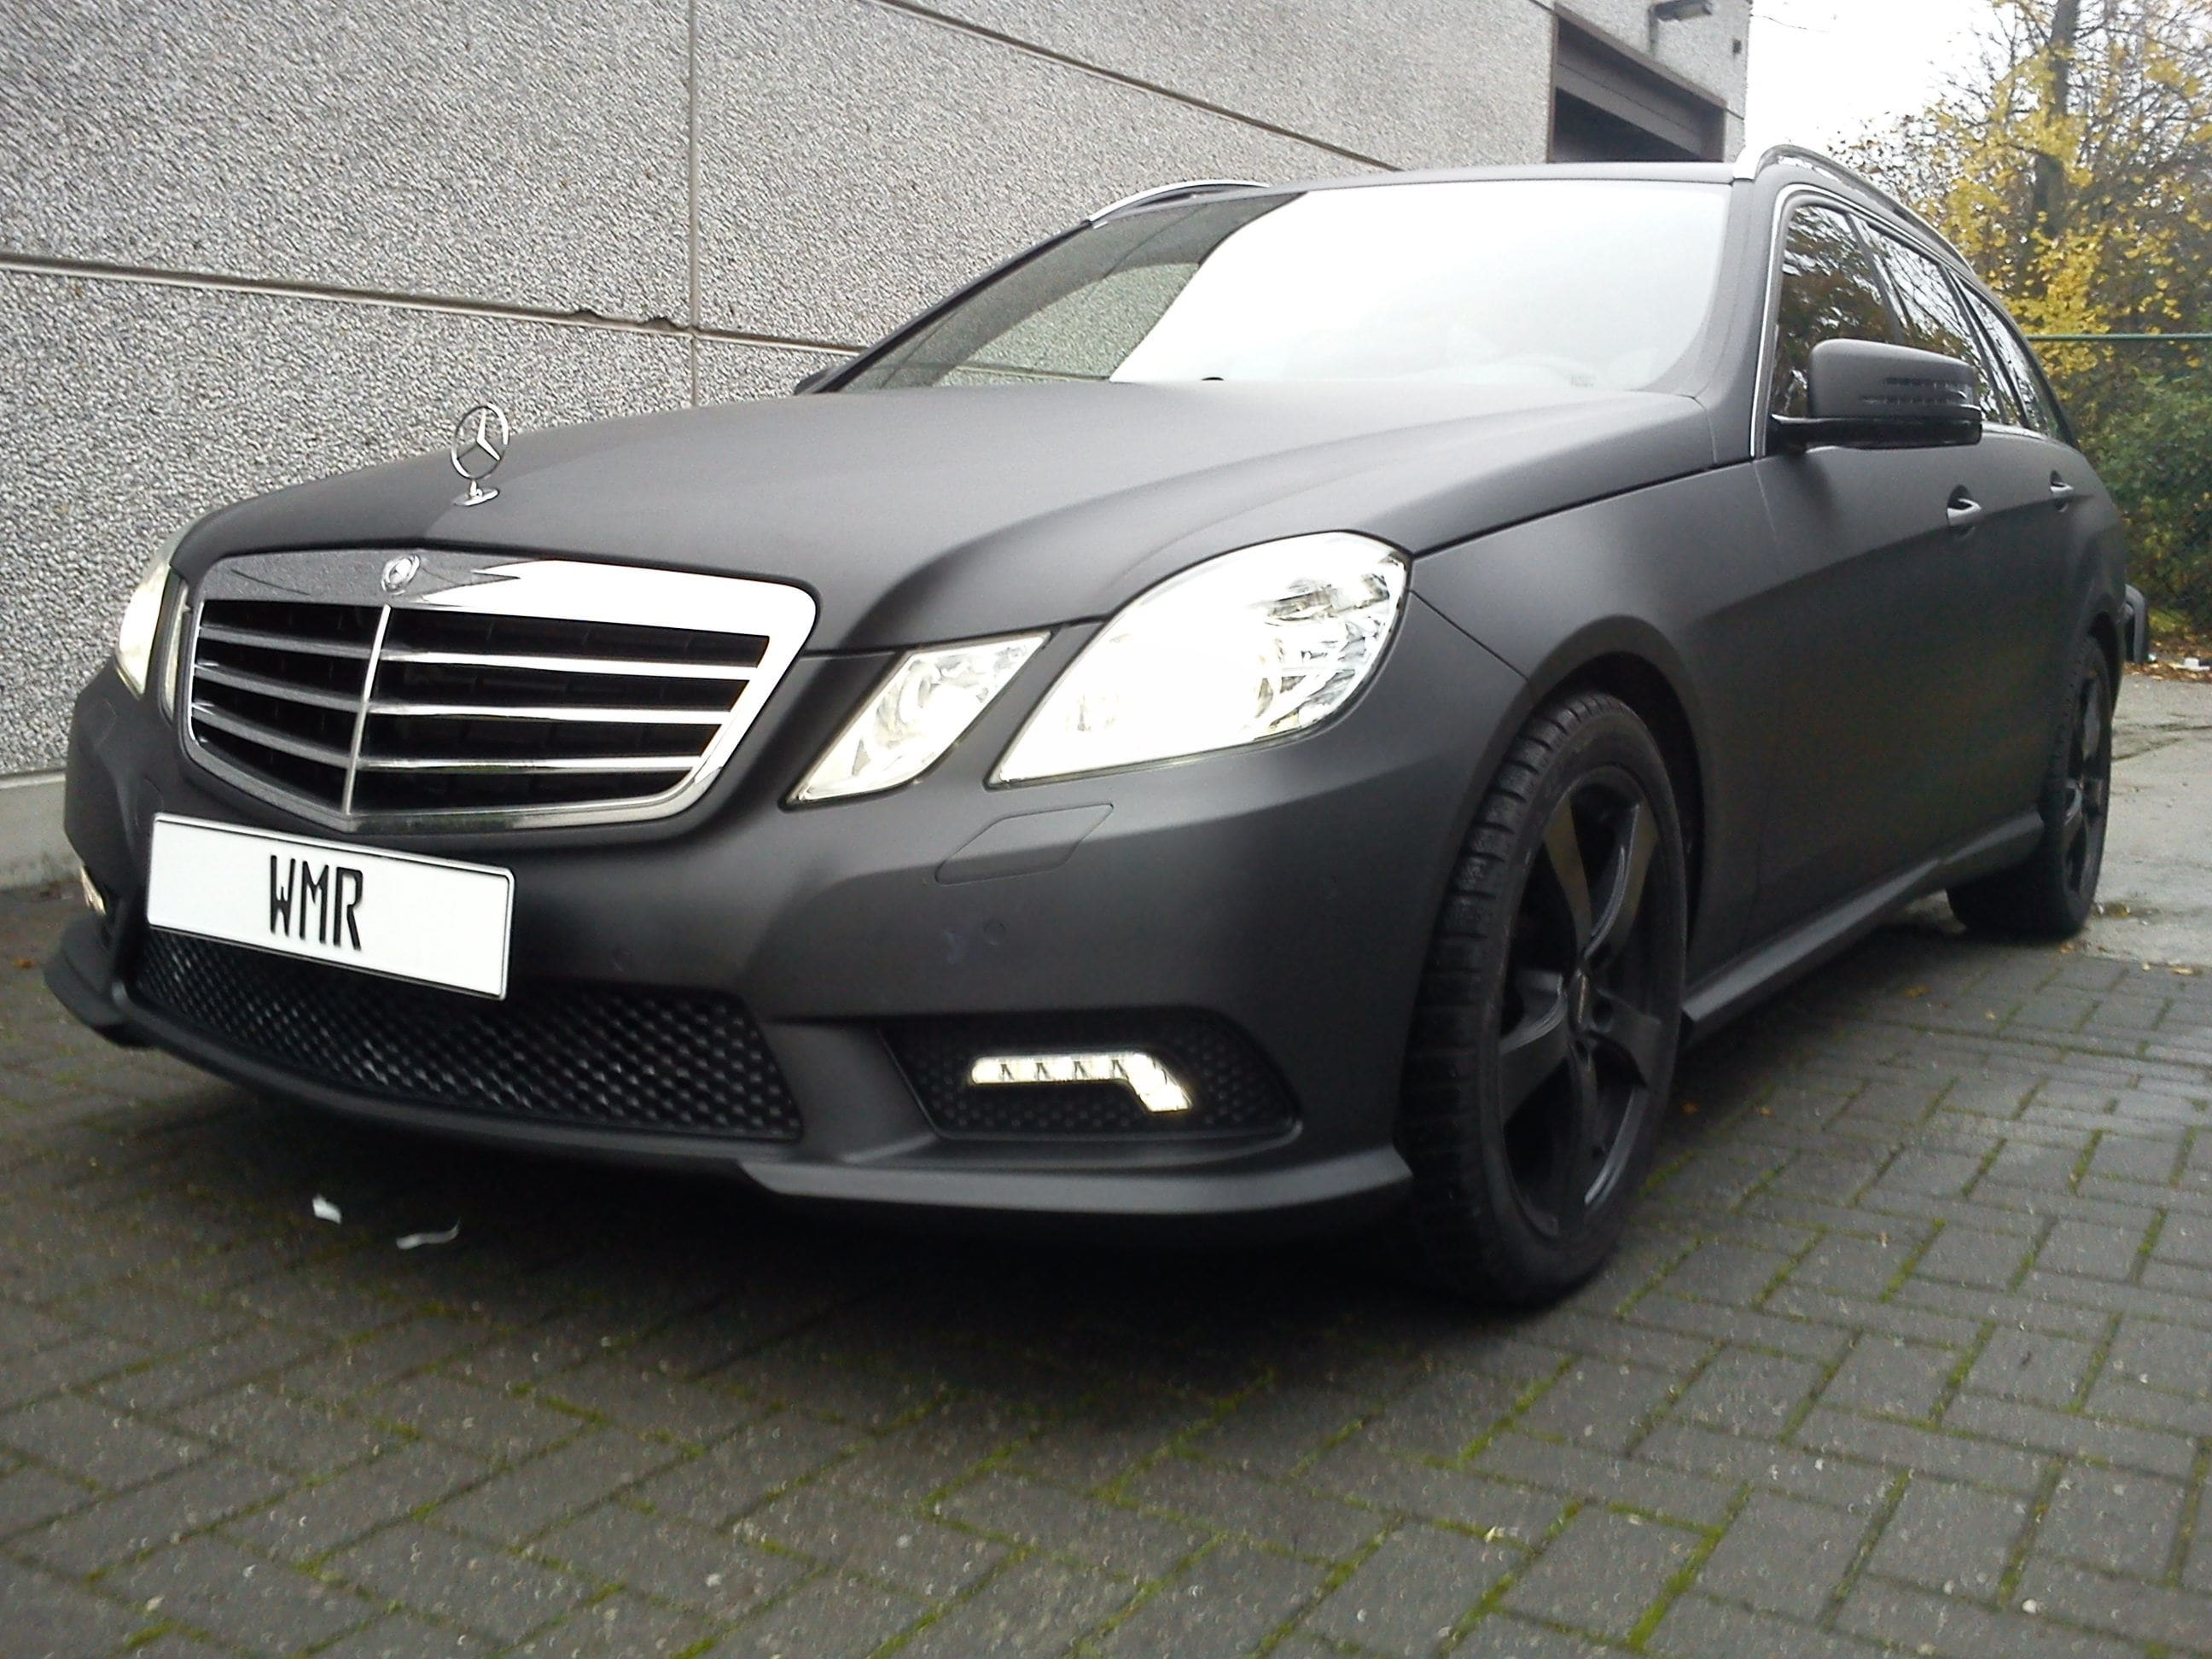 Mercedes E320 met Mat Zwarte Wrap, Carwrapping door Wrapmyride.nu Foto-nr:6228, ©2021